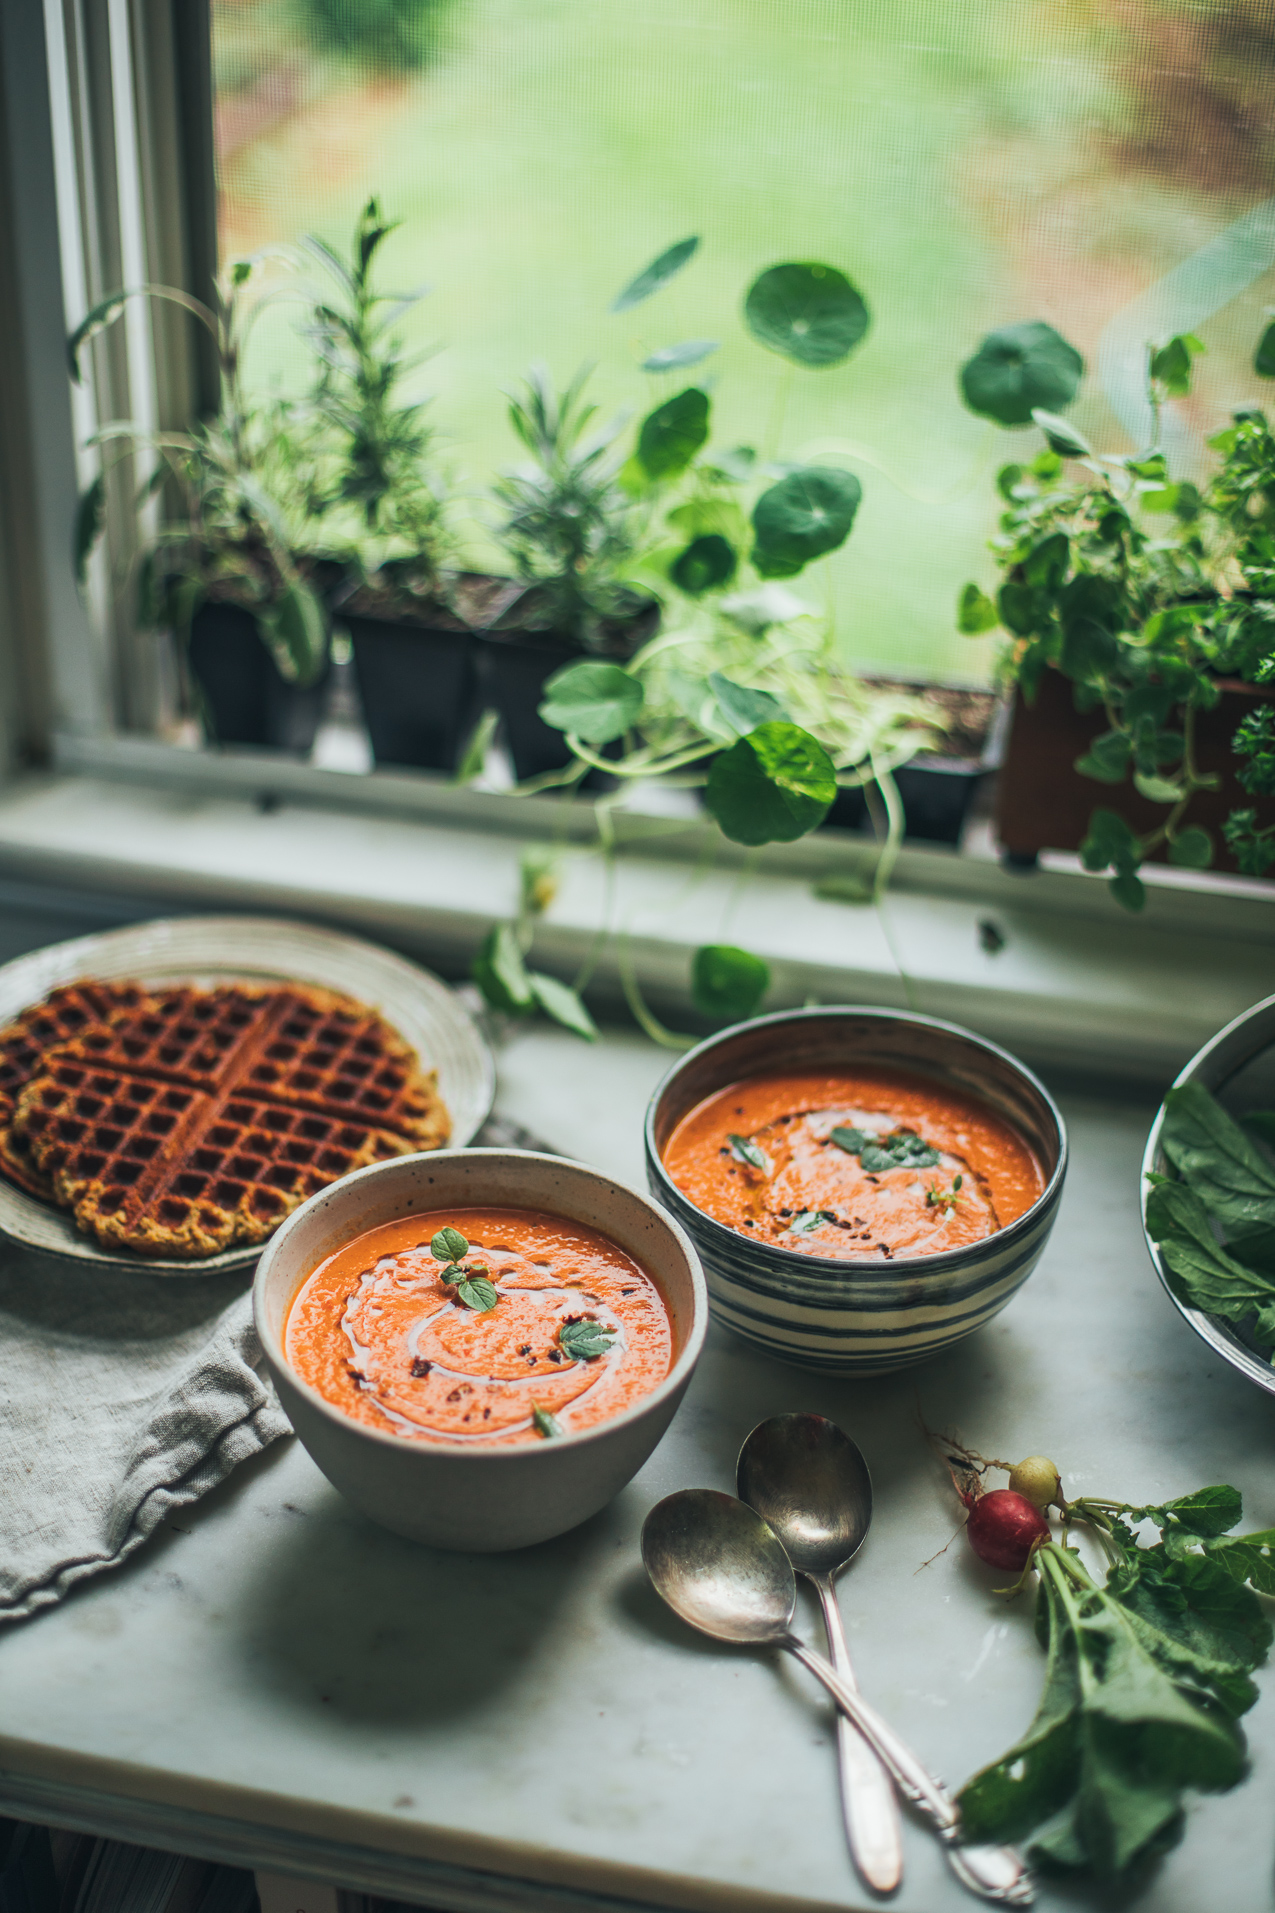 tomato-soup-almond-waffles-5997.jpg